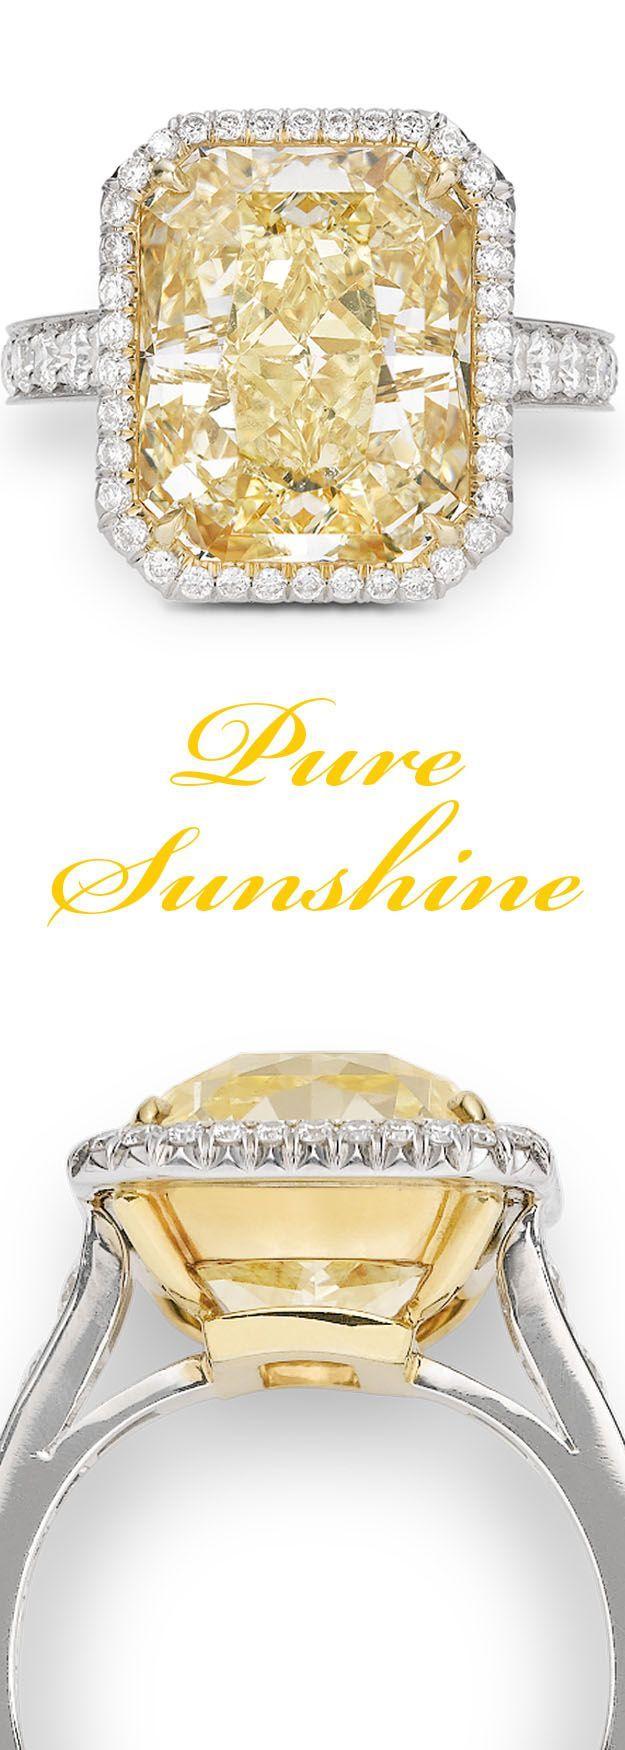 This awe inspiring 1021 carat yellow diamond bears the natural this awe inspiring 1021 carat yellow diamond bears the natural fancy color grade ms nvjuhfo Gallery